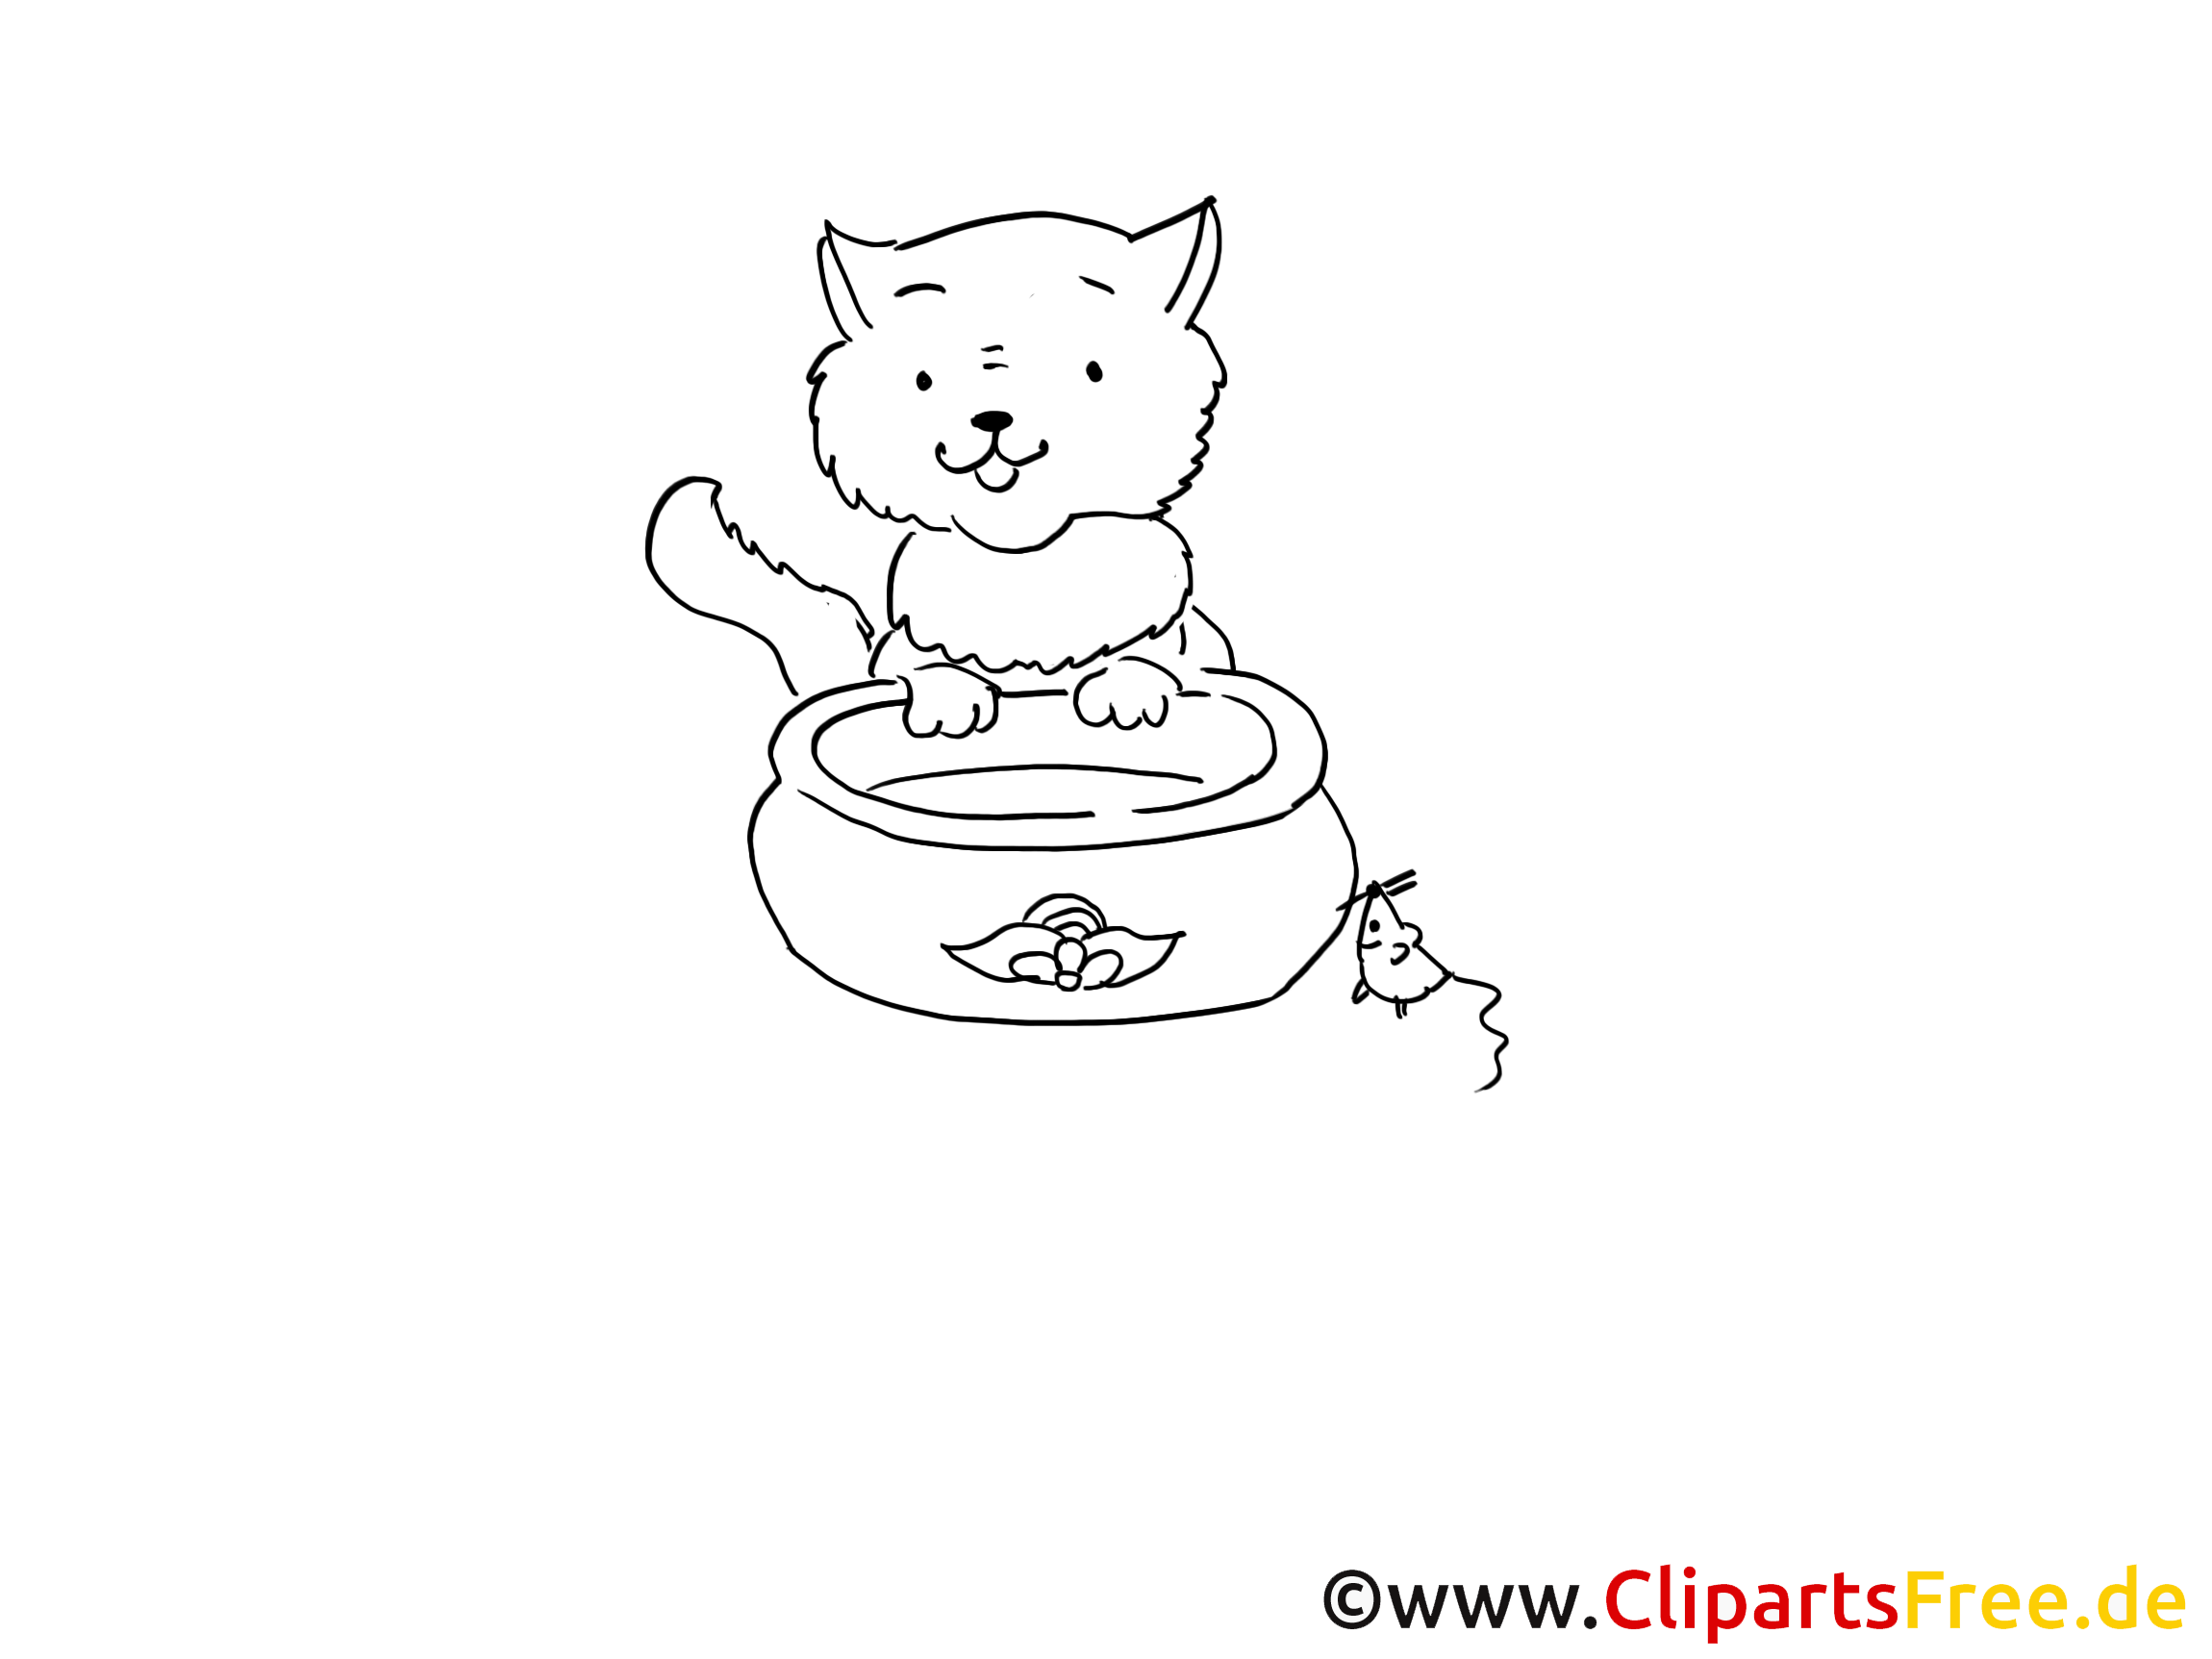 Katze Bild zum Malen